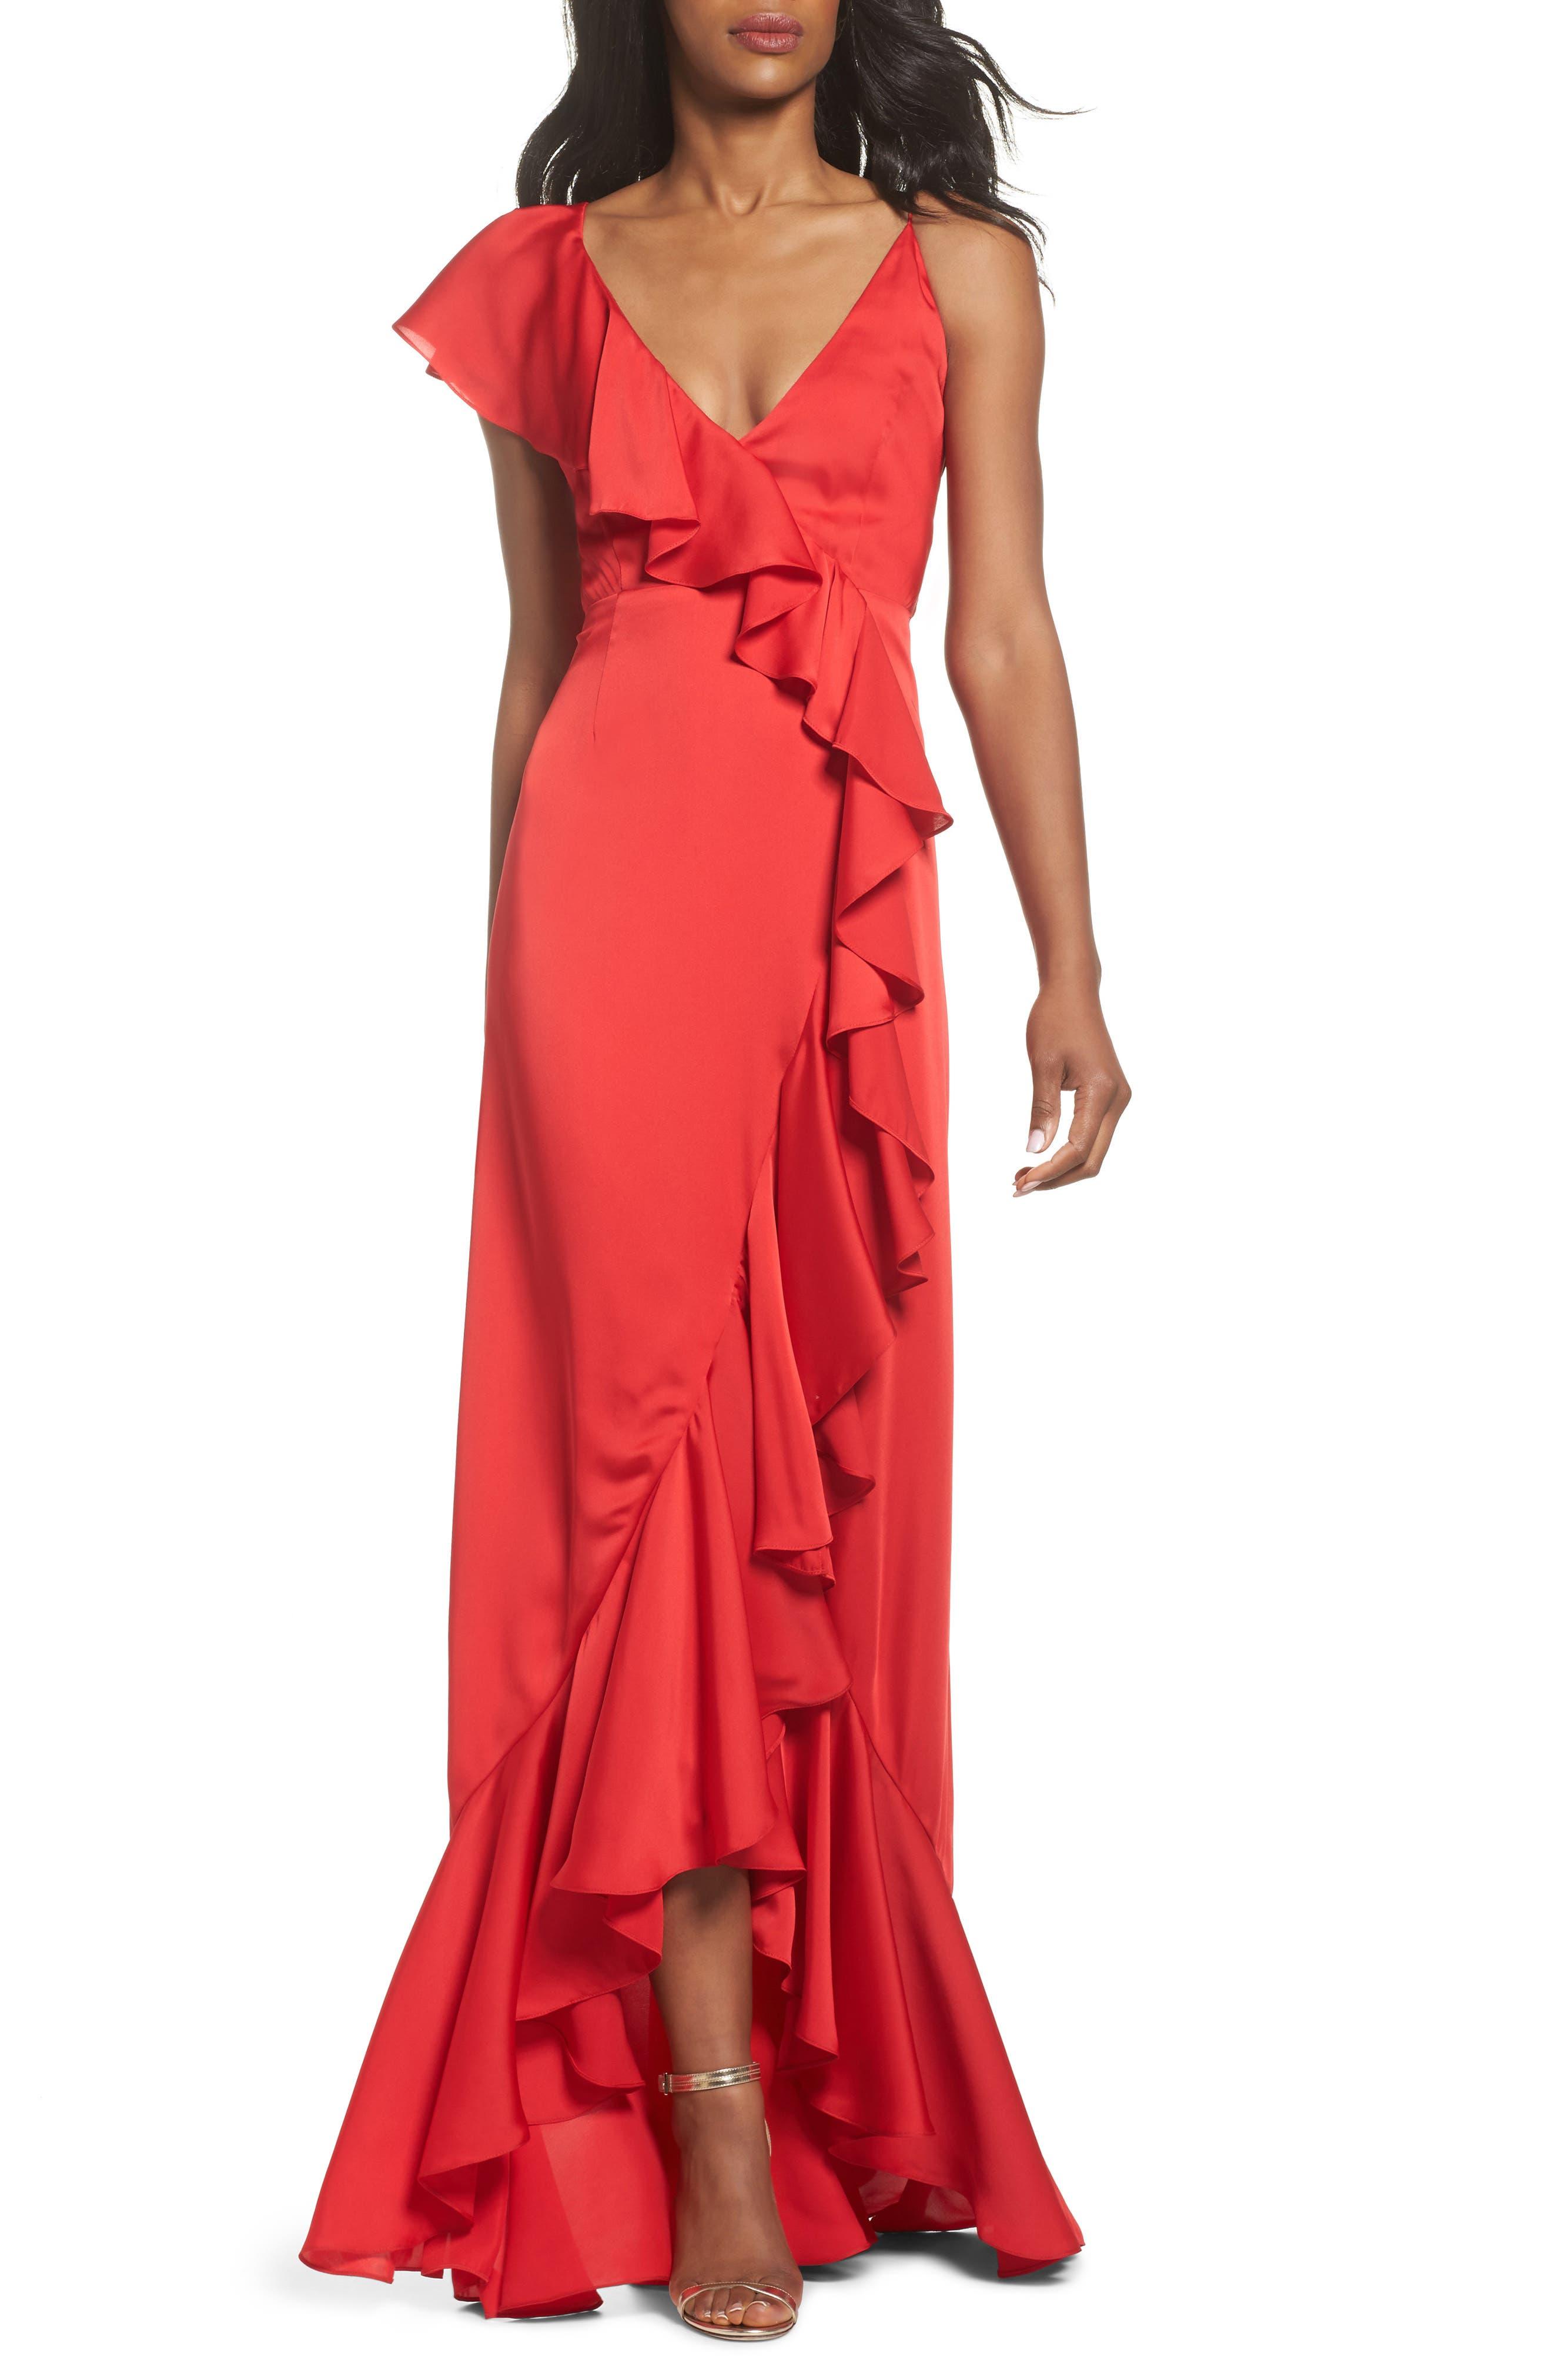 Jill Jill Stuart Ruffle Detail Gown